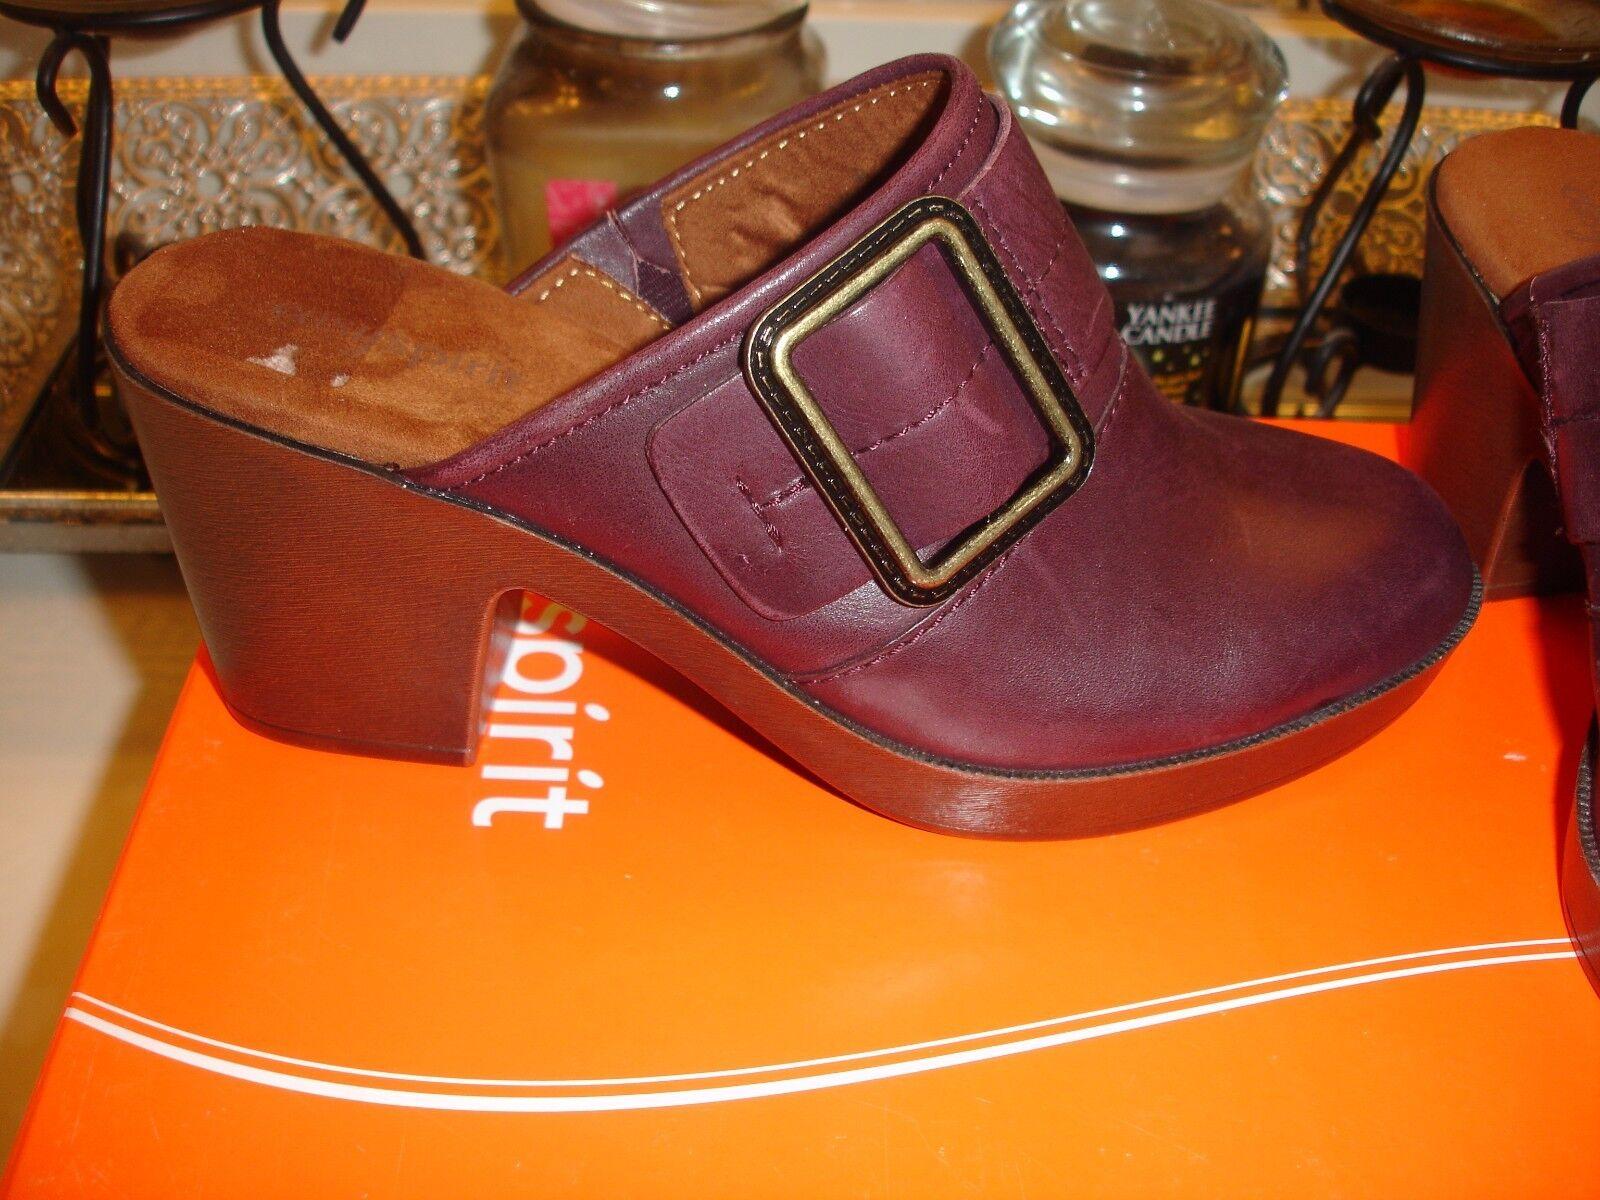 Easy Spirit Easyspirit Harvina Wine Mule Wine Harvina Leder fun shoe quality Nice 89 18569d